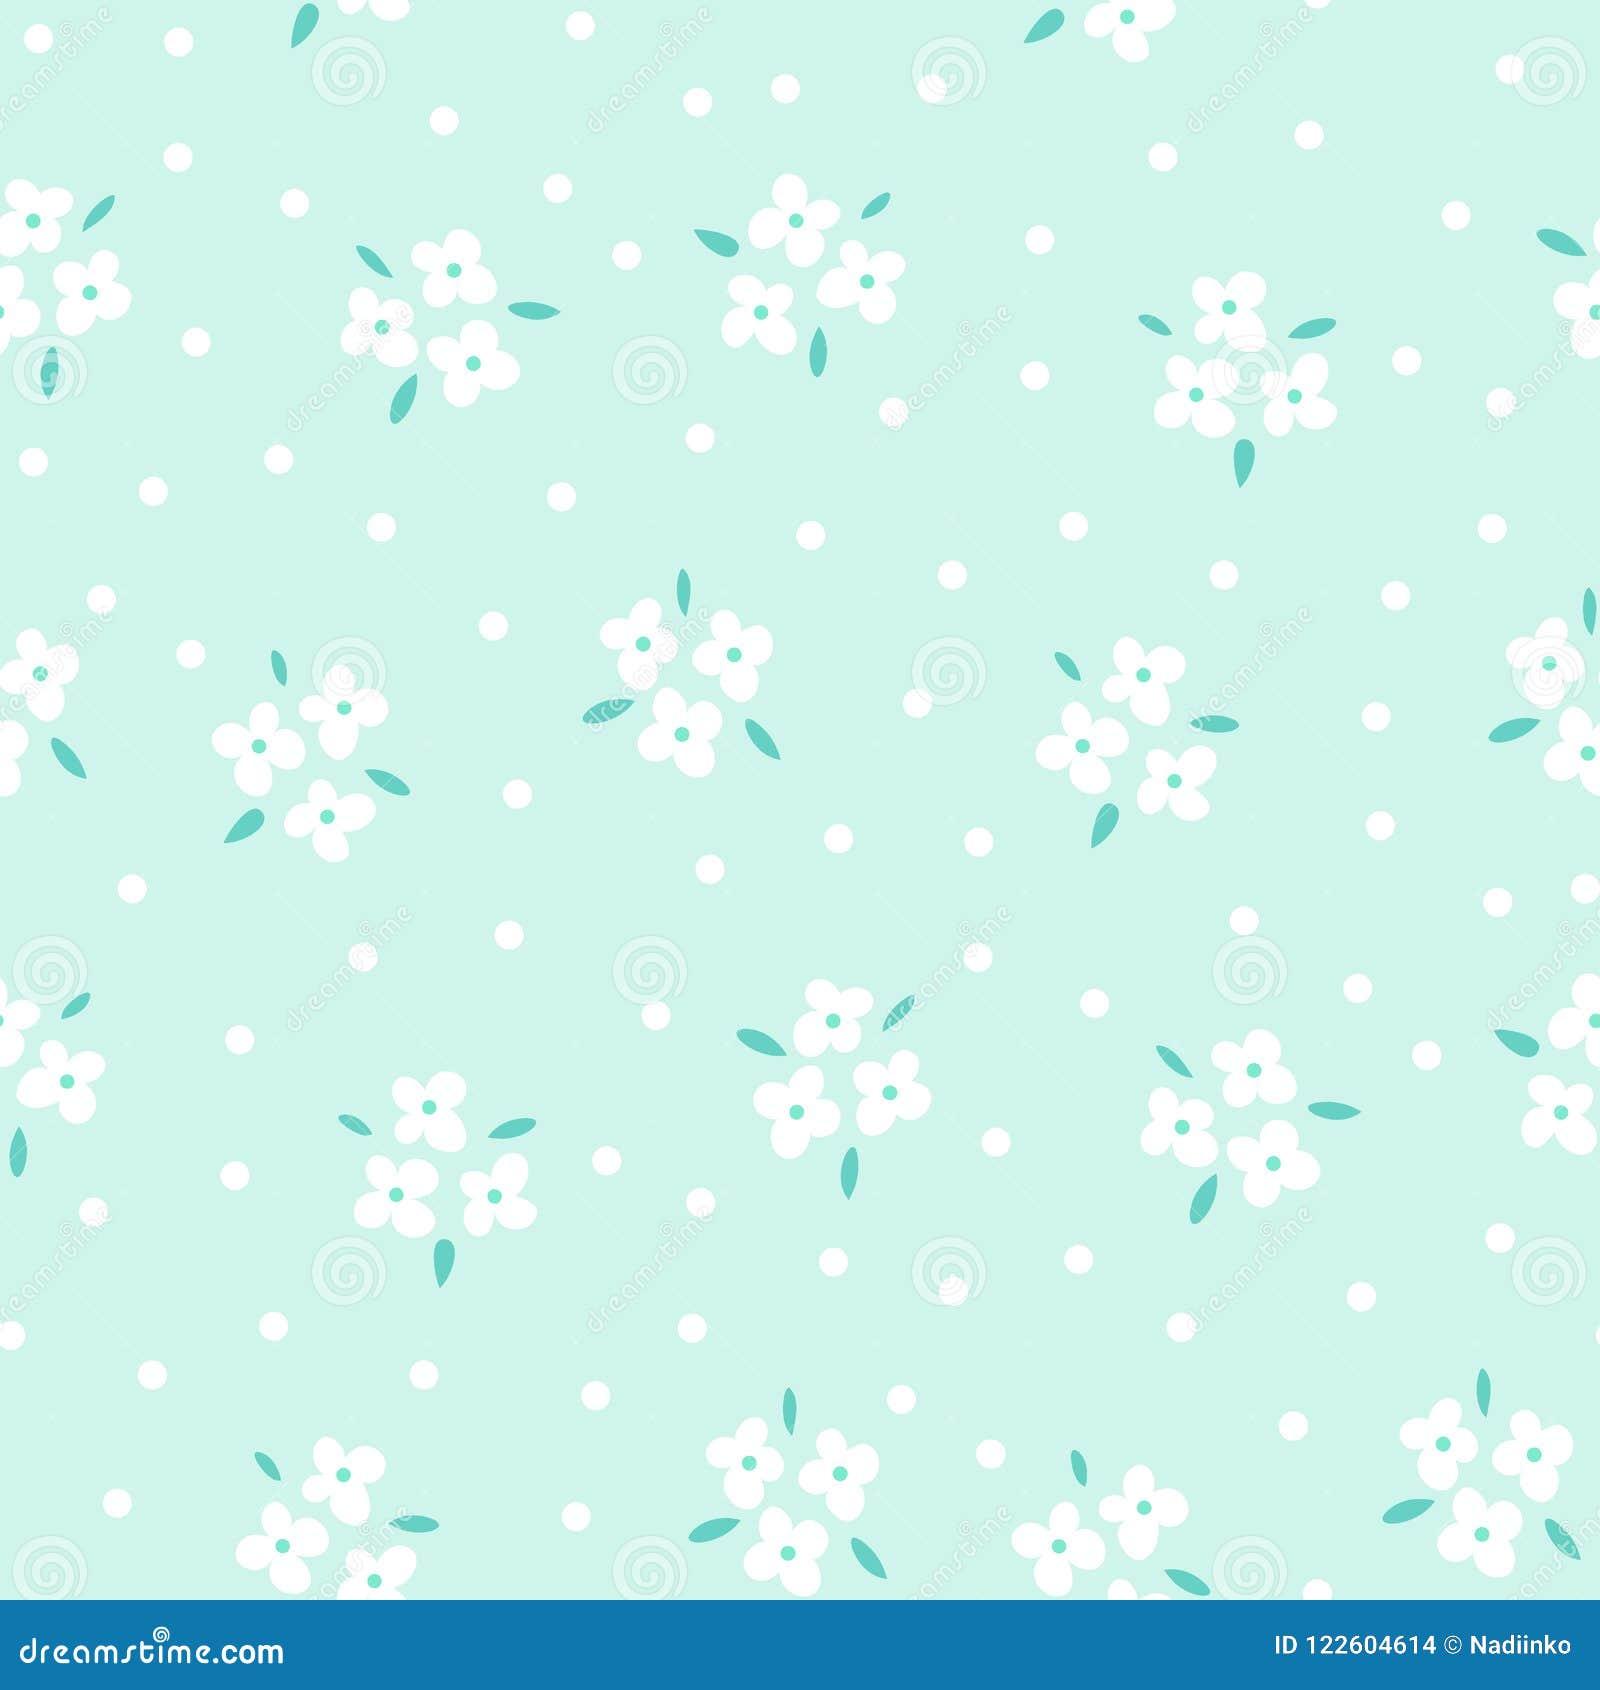 Floral άνευ ραφής σχέδιο με τα άσπρα λουλούδια στο μπλε υπόβαθρο Επαναλαμβανόμενο ελαφρύ σκηνικό, μαλακή υφαντική σύσταση έξυπνο